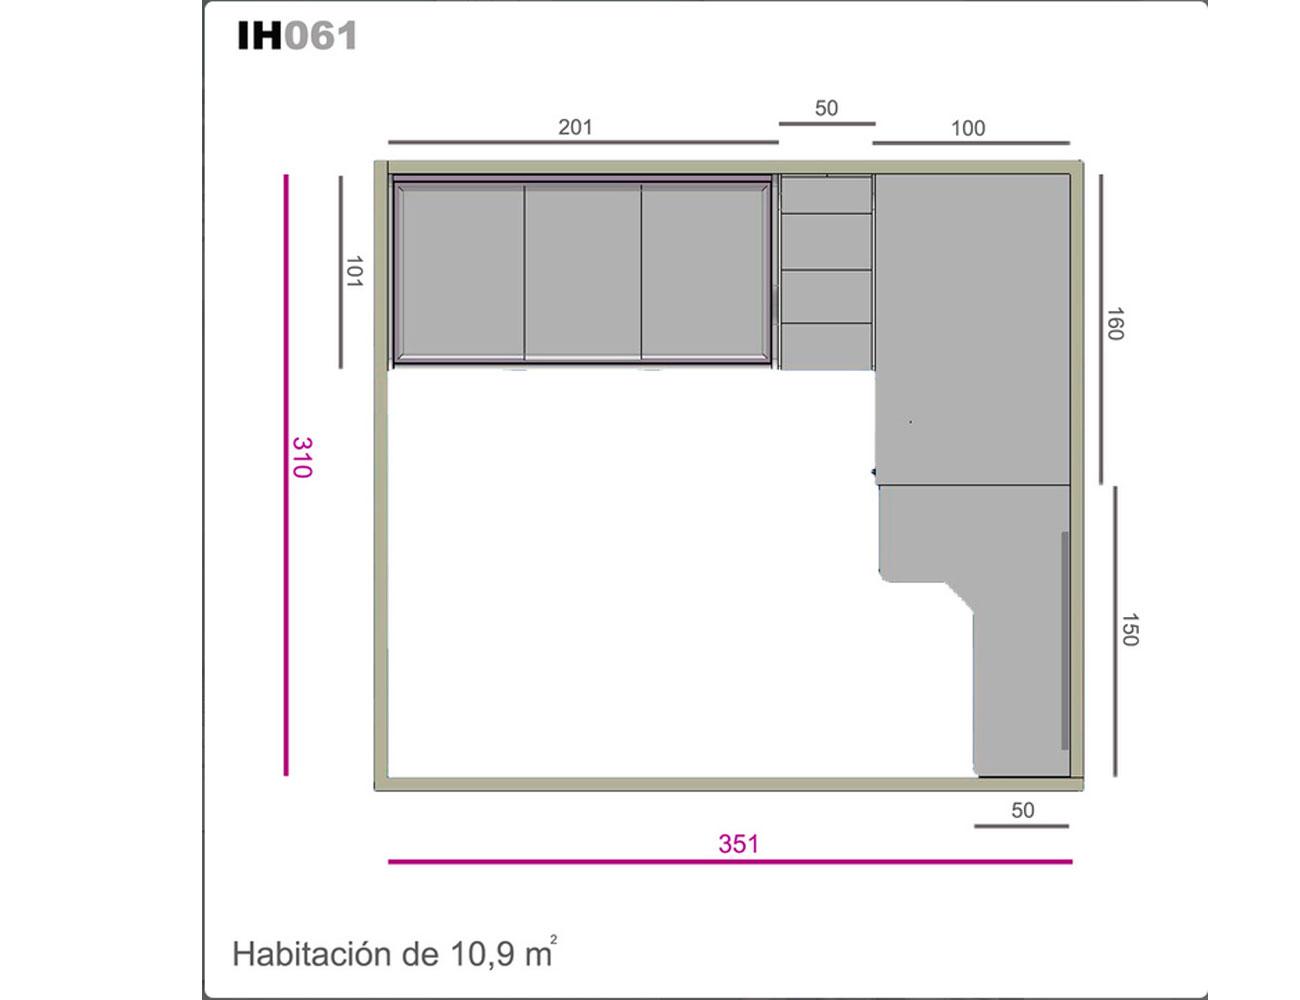 Ih061 medidas